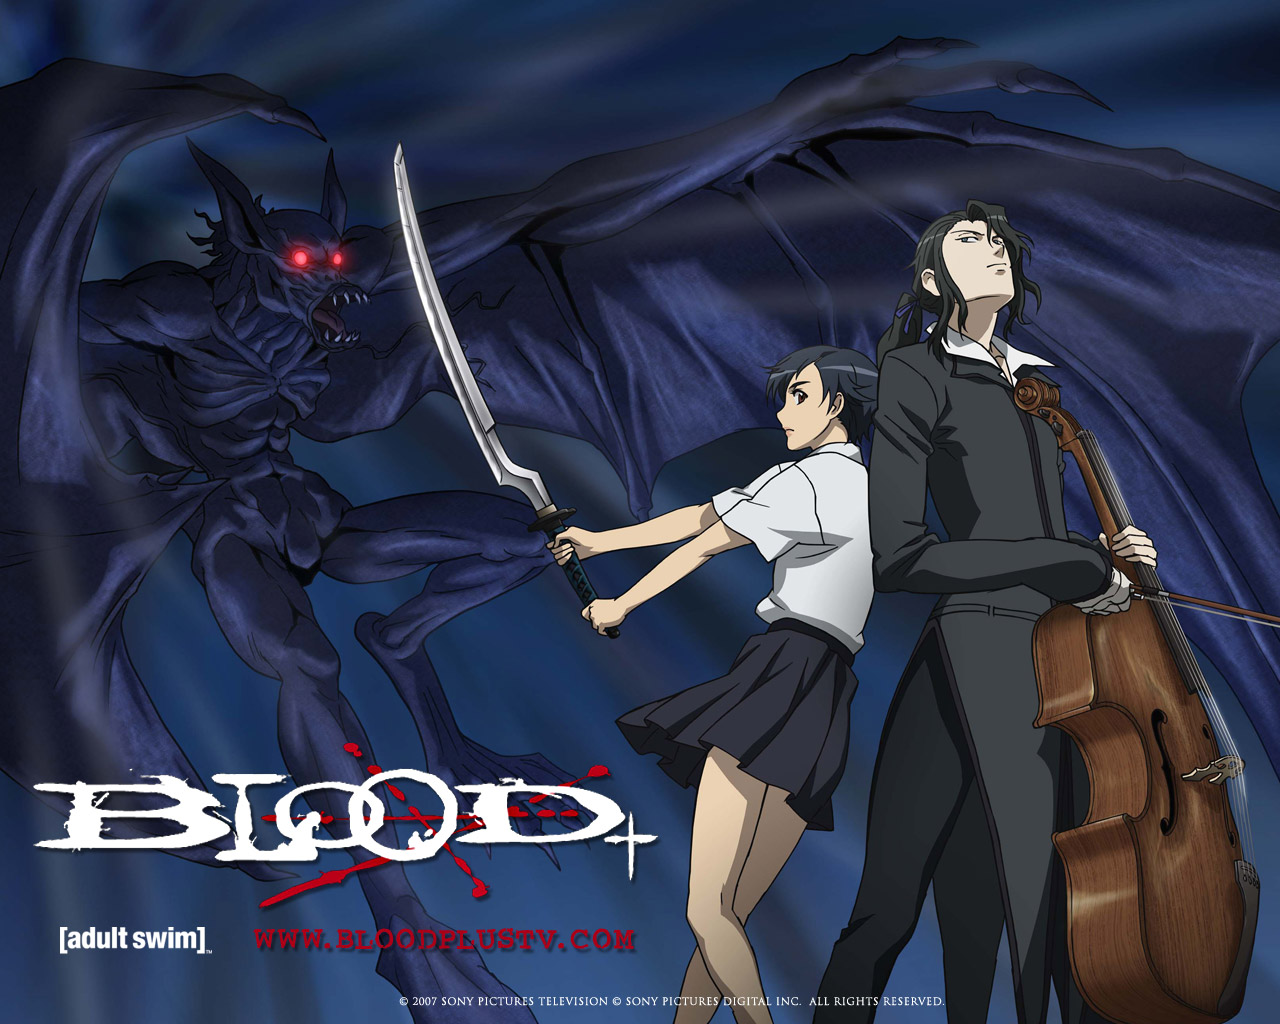 http://1.bp.blogspot.com/-Vh43rYMBMcE/T9I24L9wIBI/AAAAAAAABI8/SpEpEudIXsA/s1600/2005_bloodplus_wallpaper_001.jpg